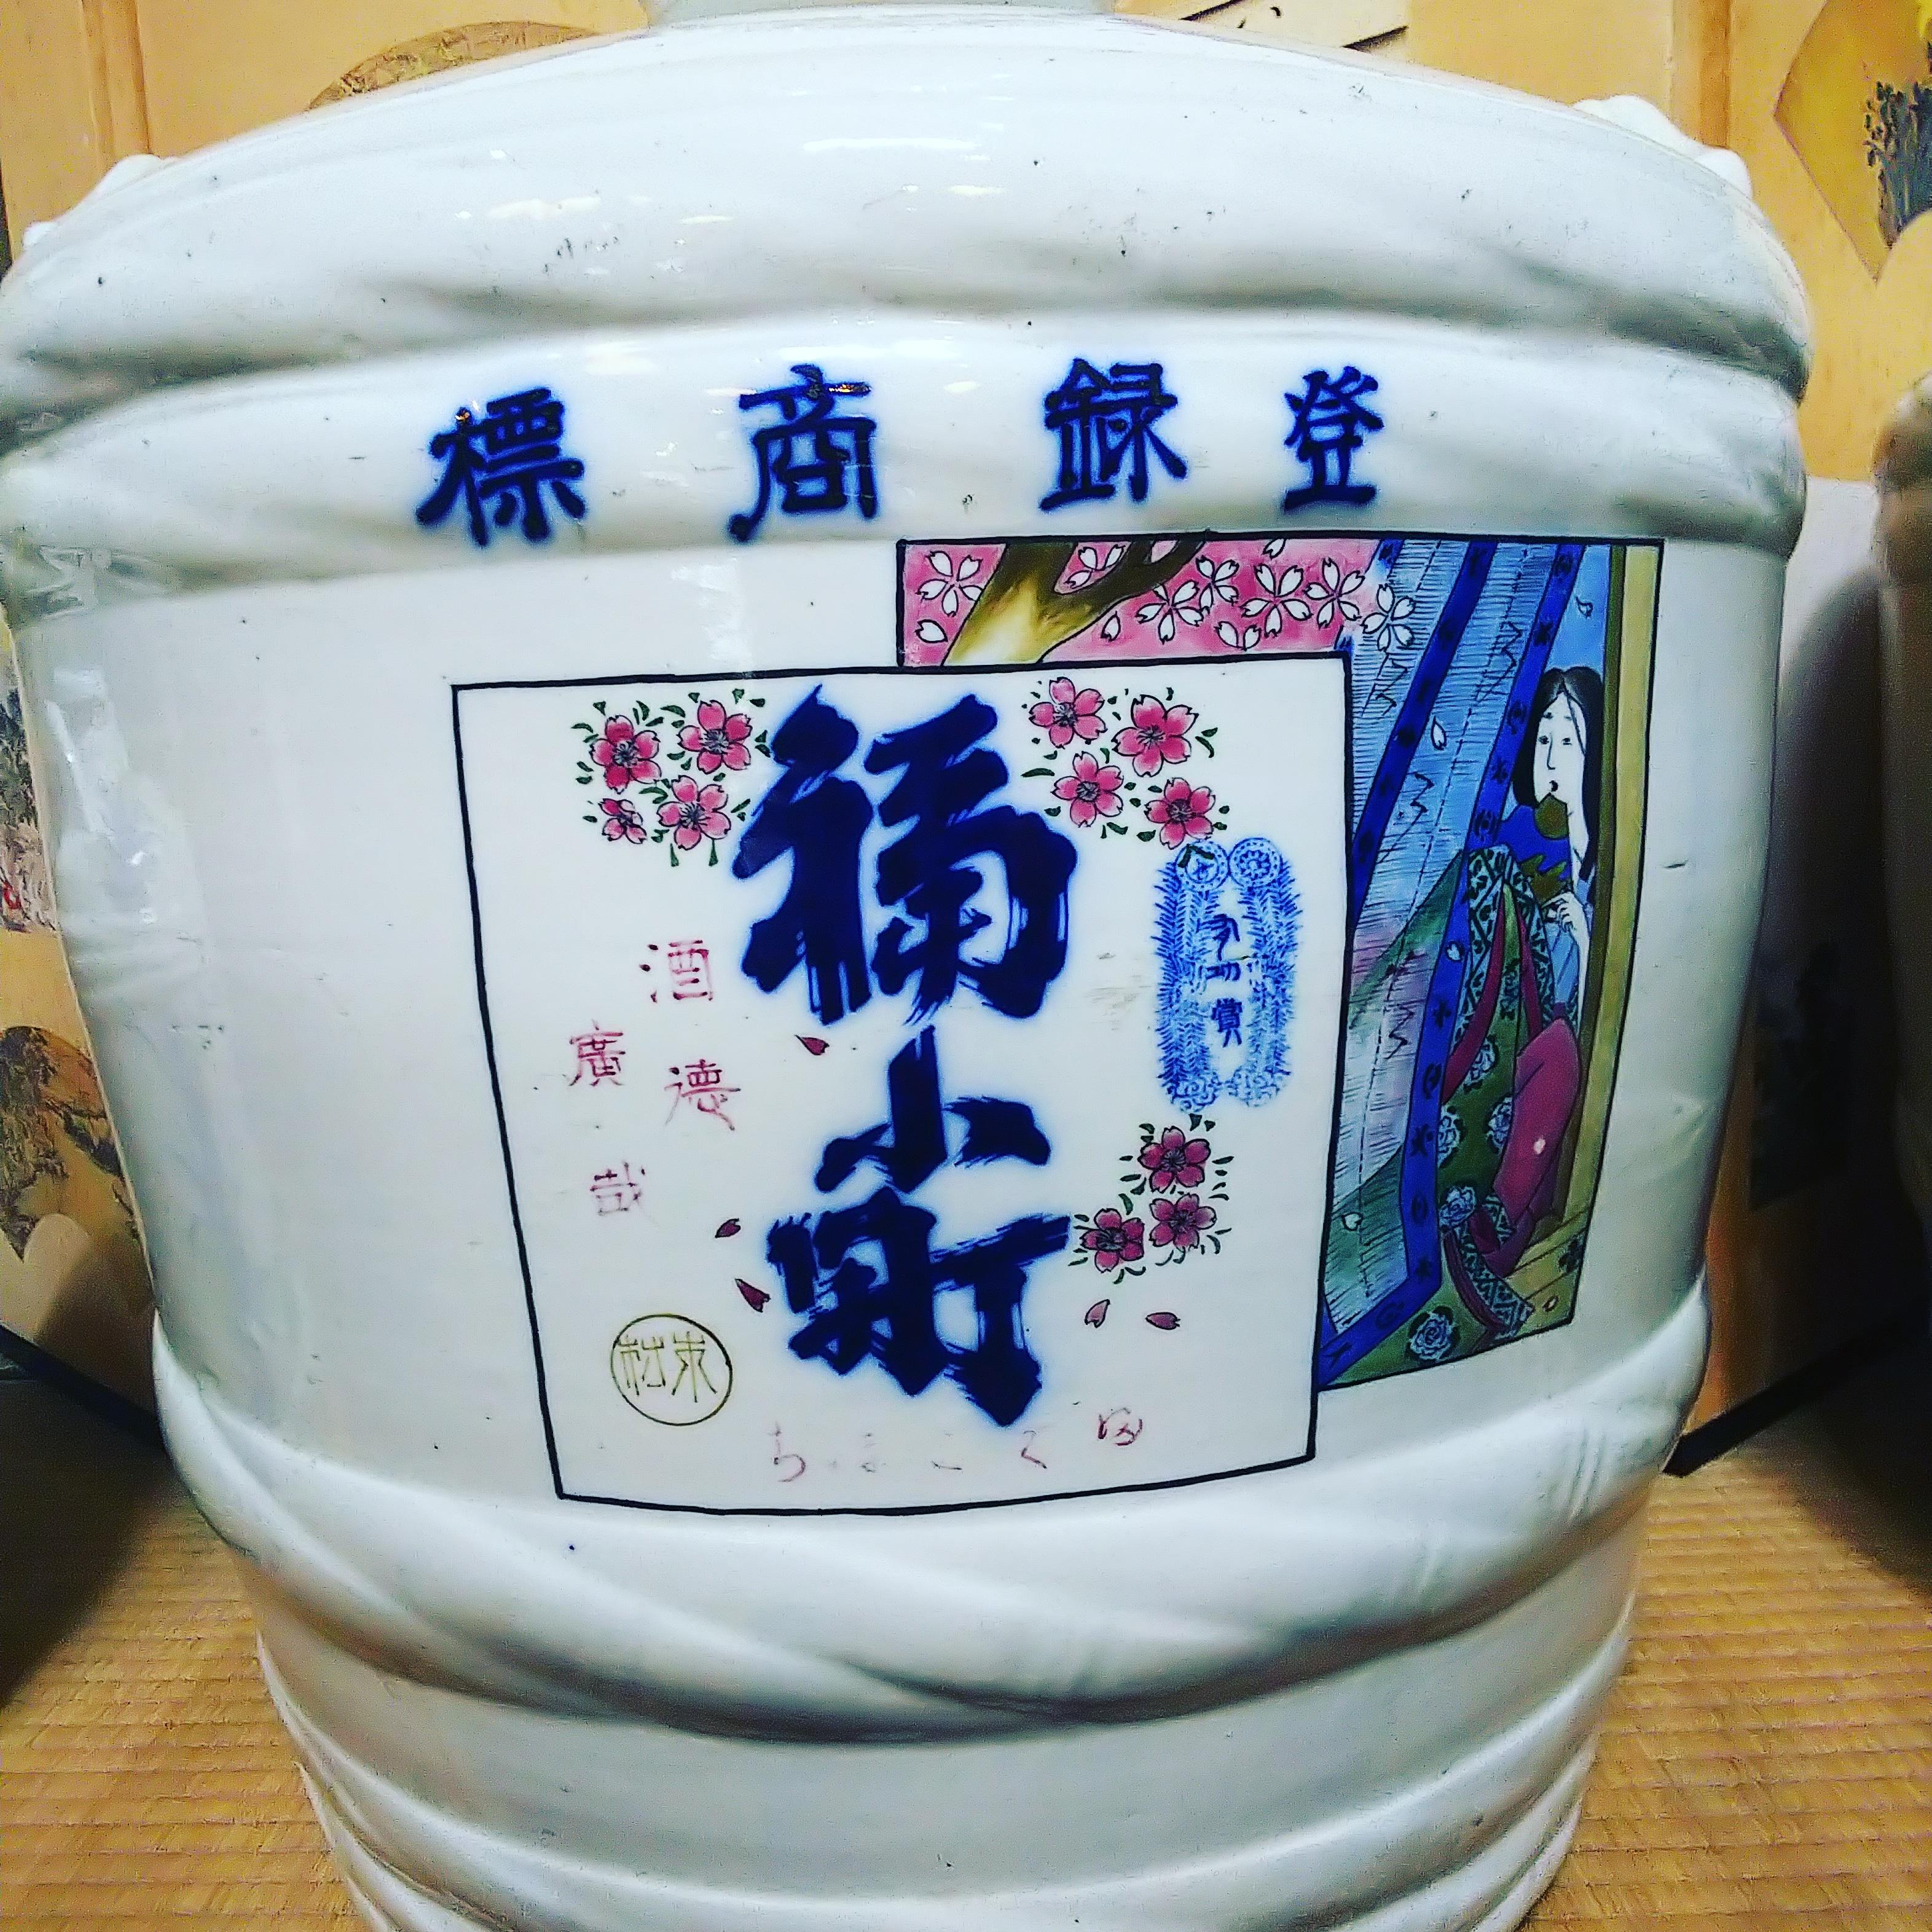 http://www.fukukomachi.com/blog/photo/IMG_20200622_190309_701.jpg